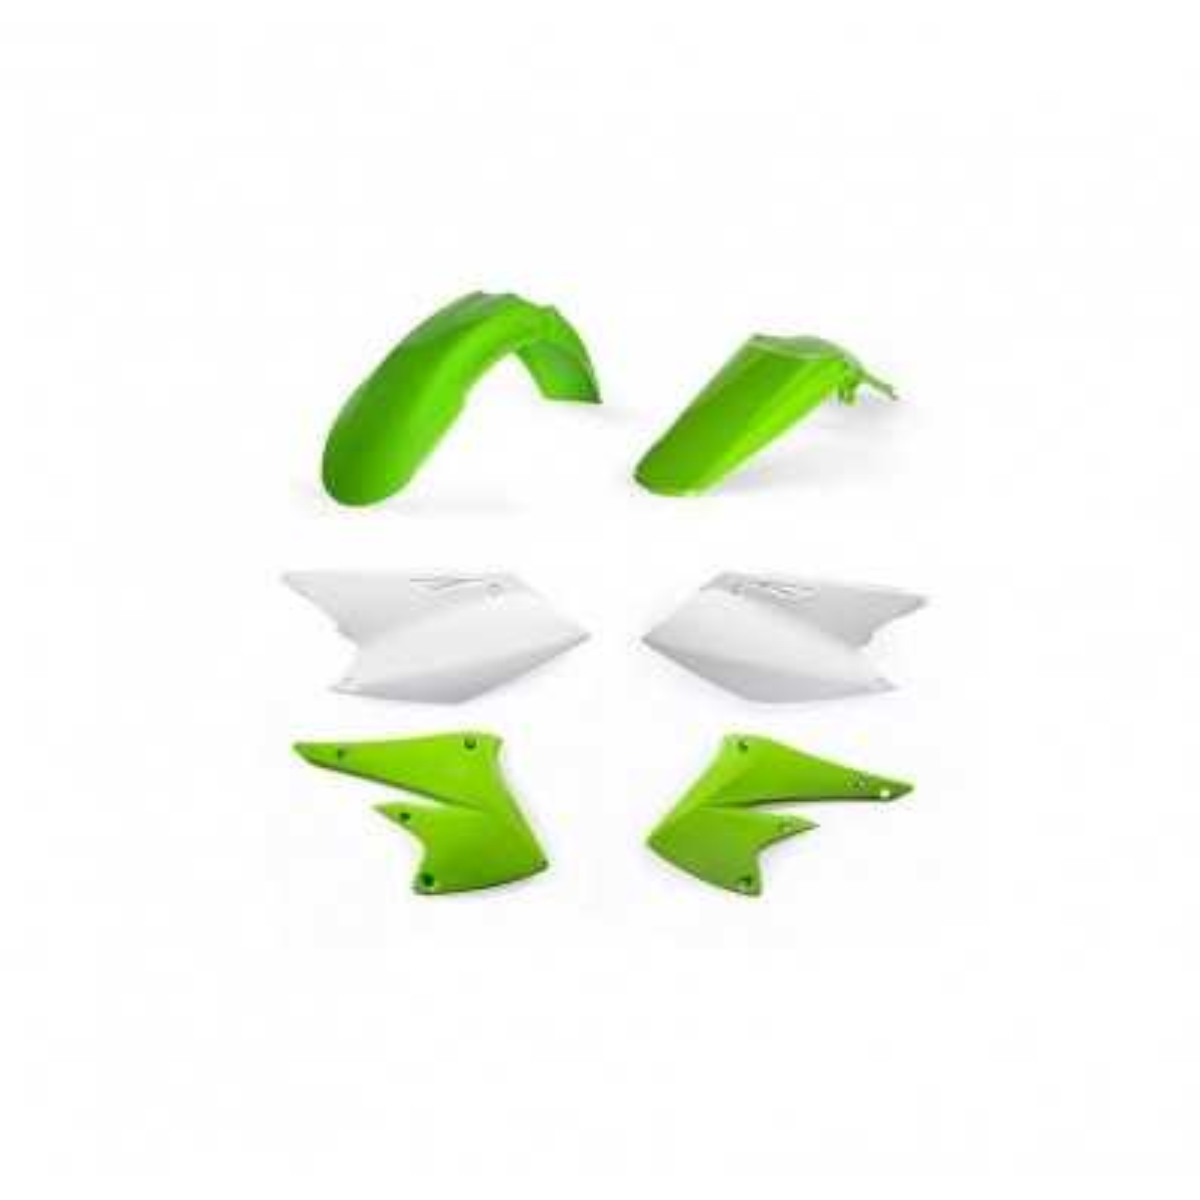 0022377-130 - Kit Plasticos Kxf 250 17 Verde